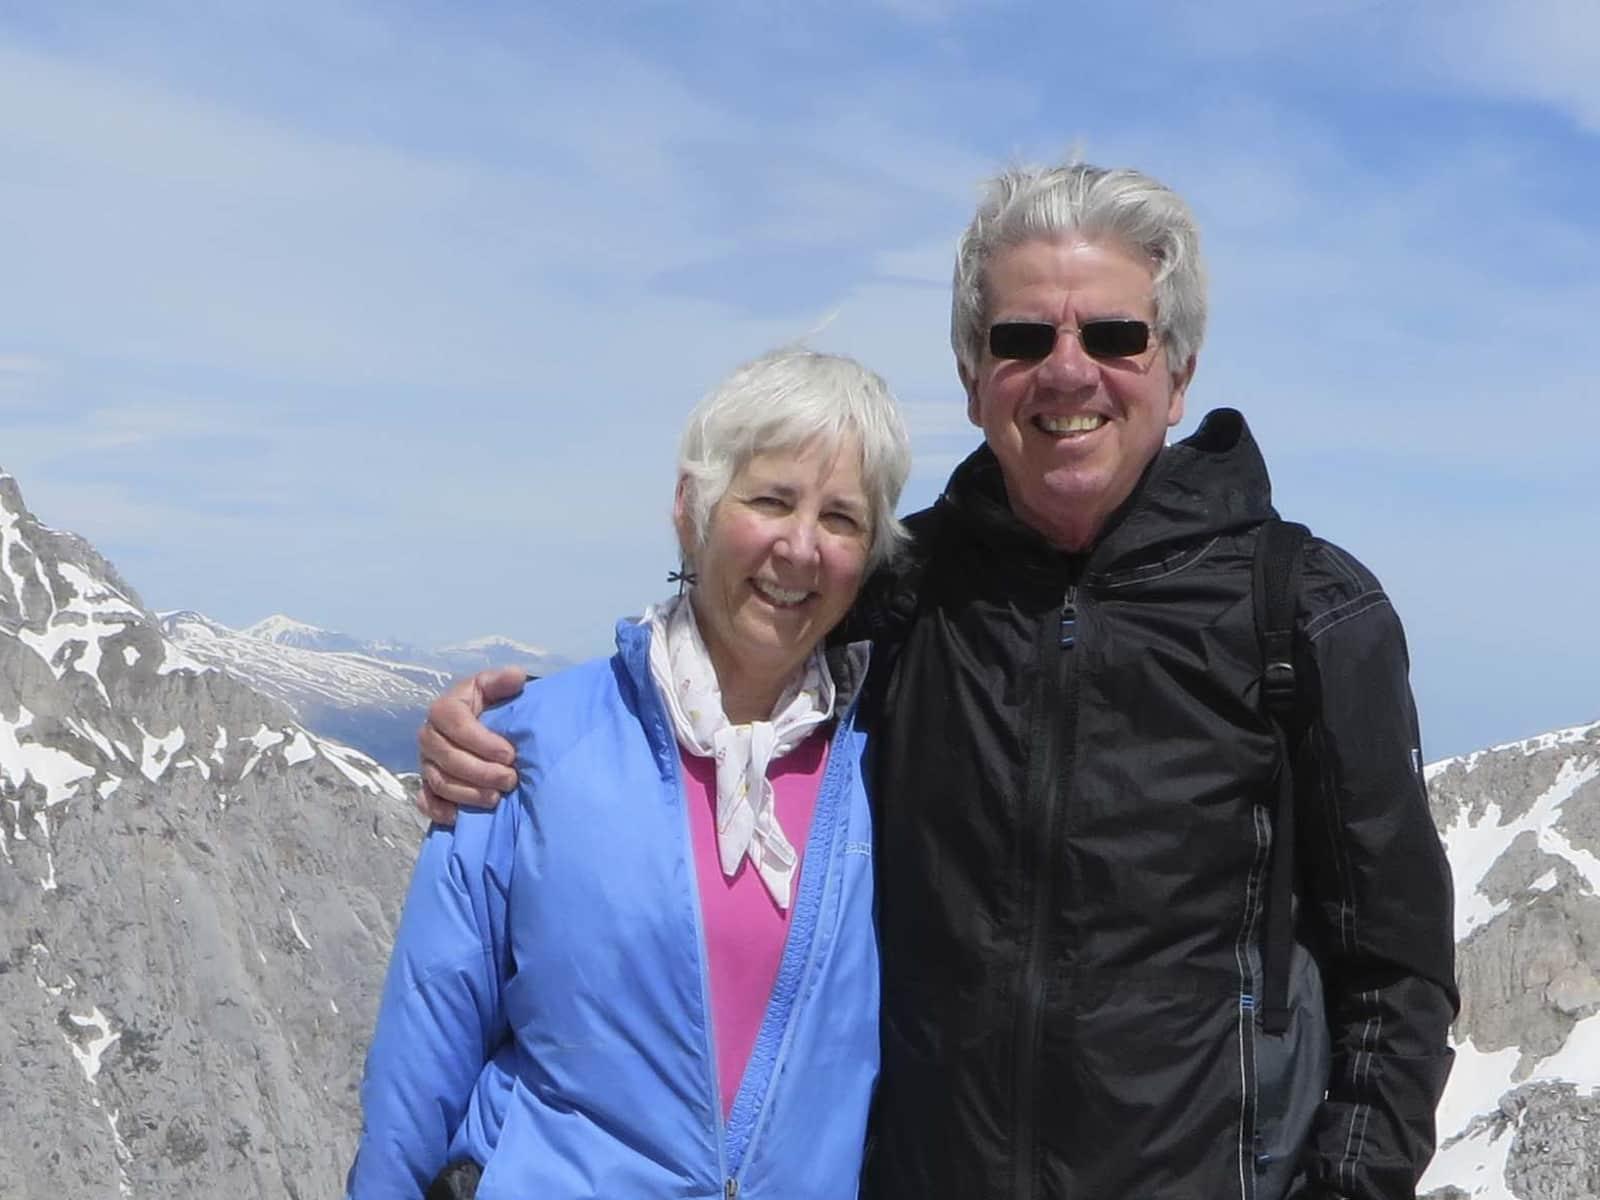 Marta & Robert from Bellingham, Washington, United States